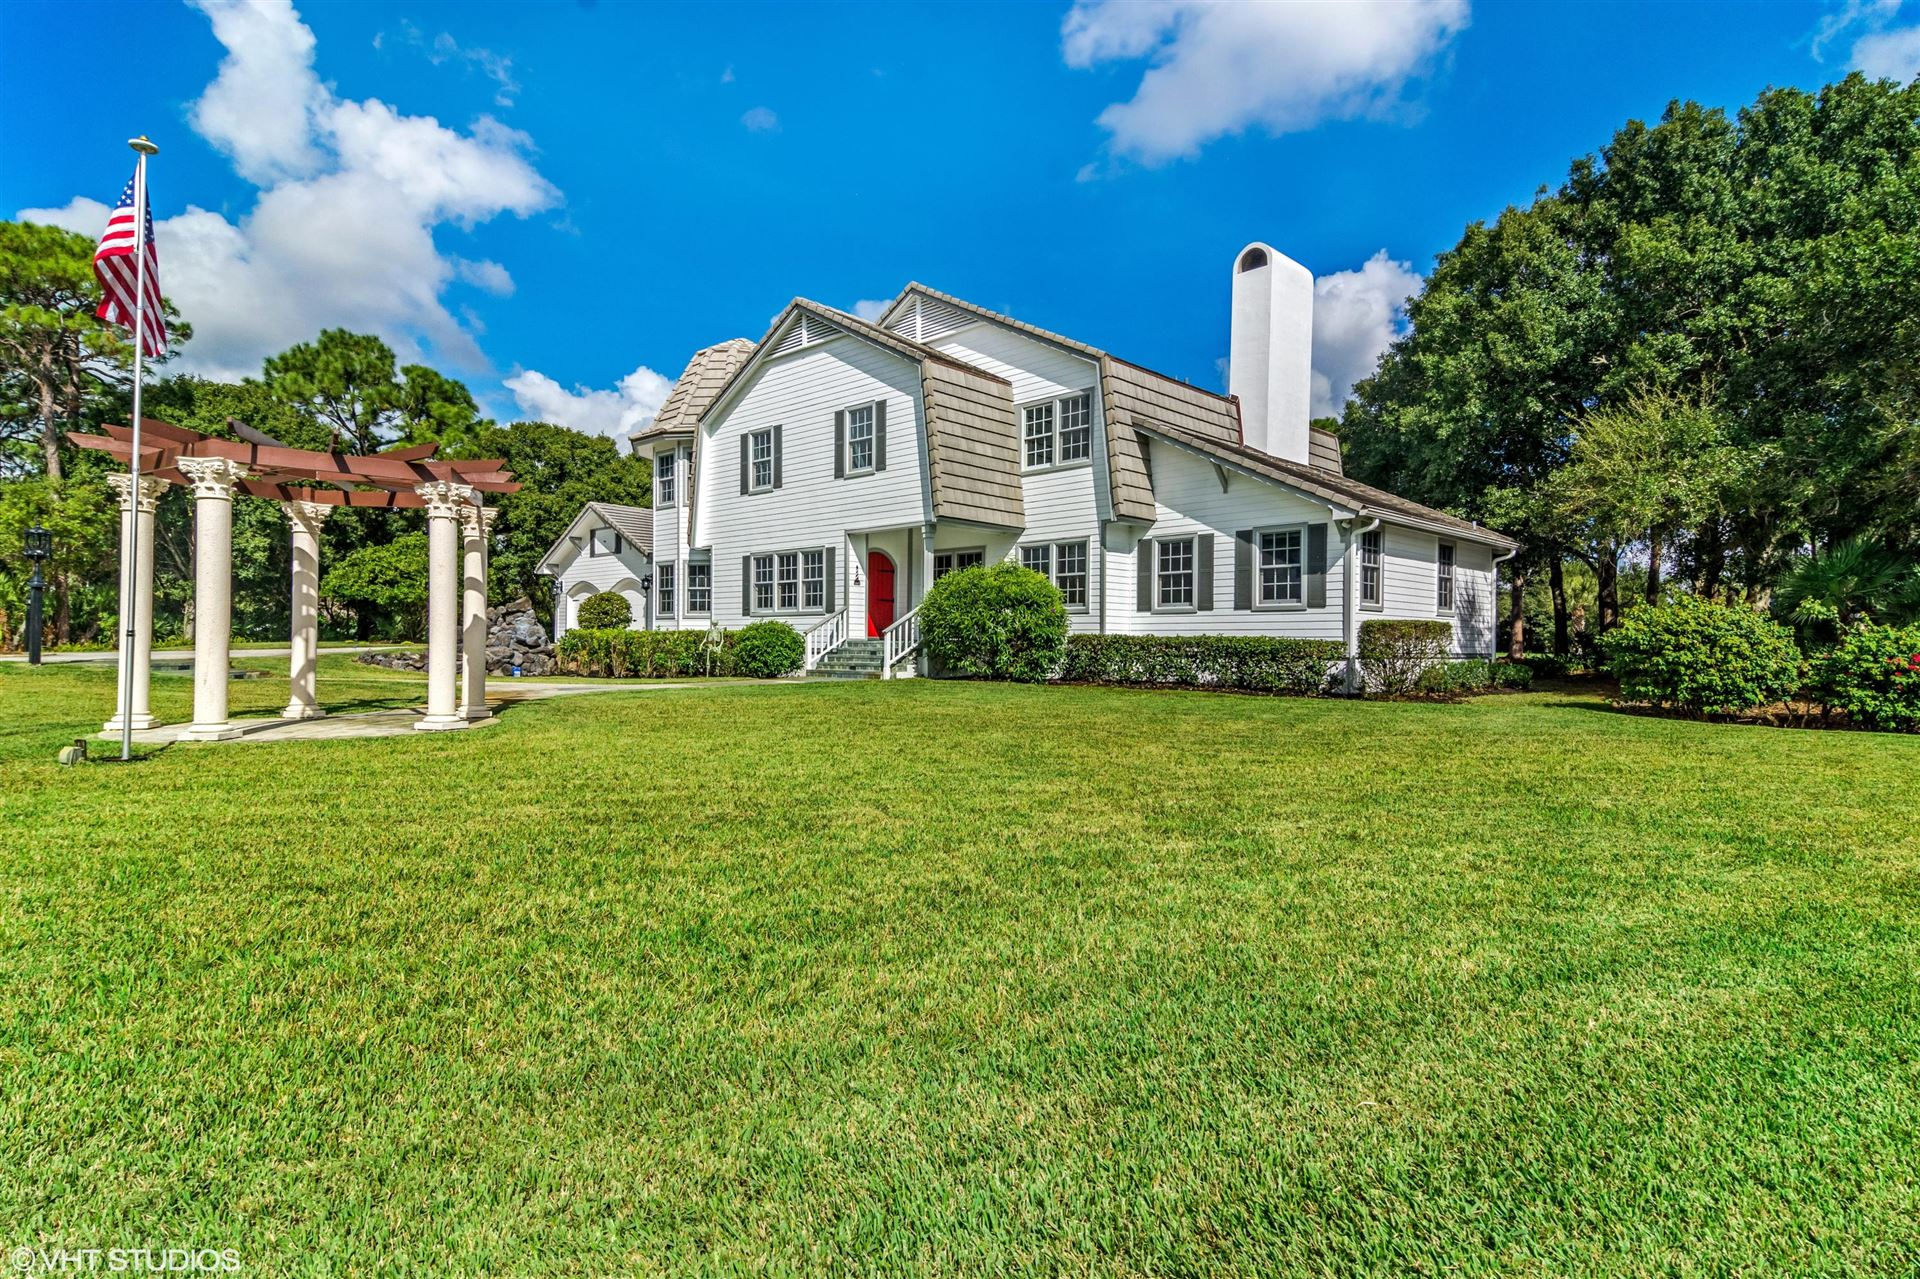 10840 Kimberfyld Lane, Port Saint Lucie, FL 34986 - #: RX-10619560